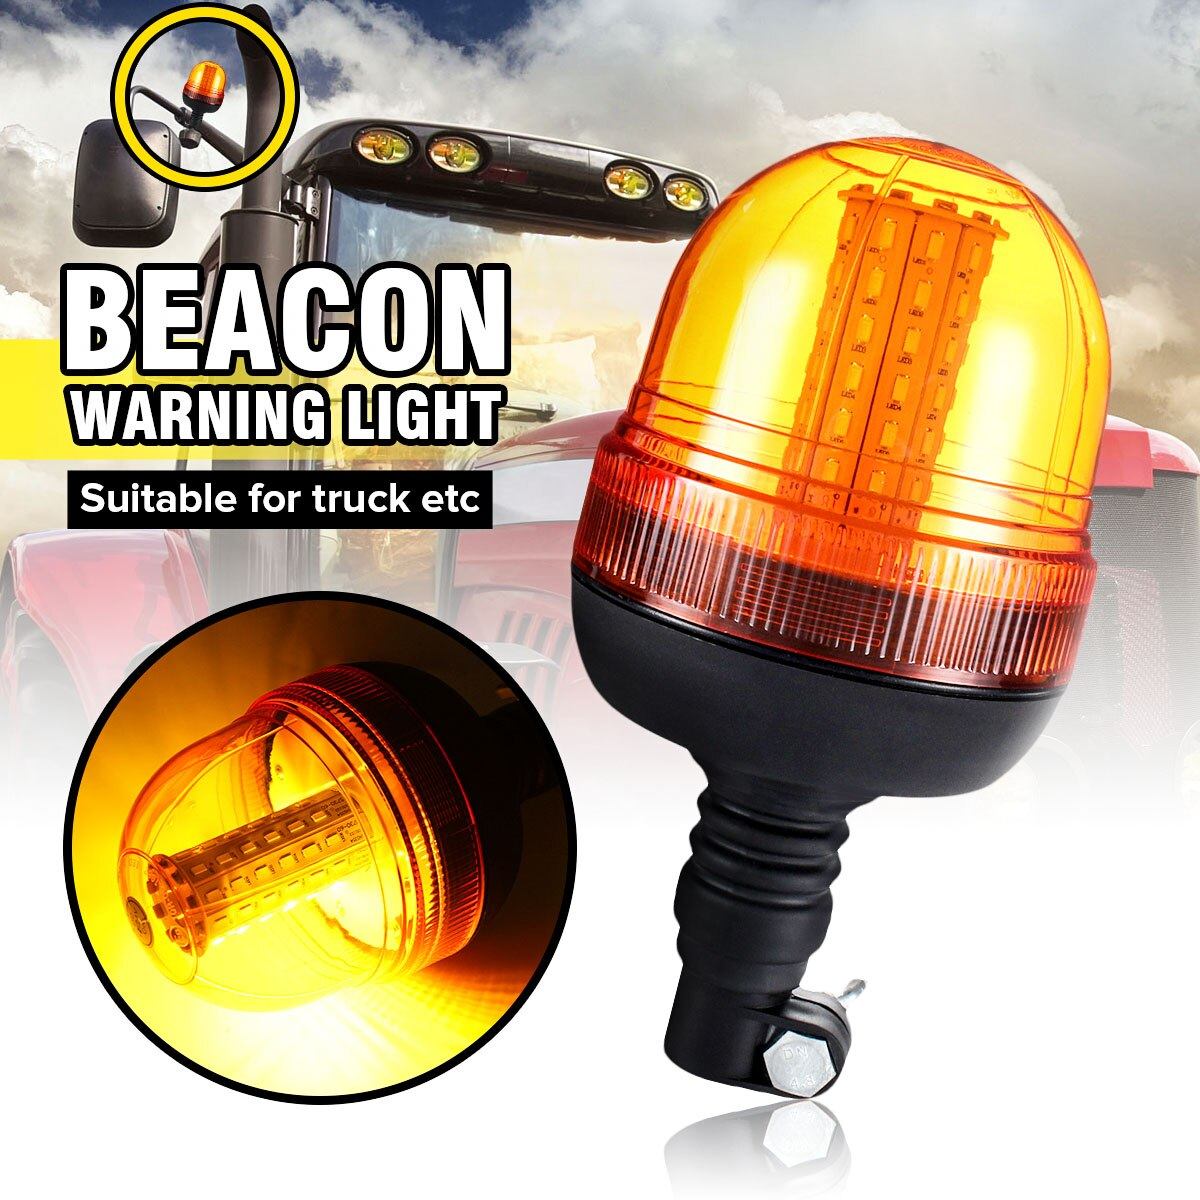 Safurance LED الدورية وامض العنبر منارة مرنة الدين القطب جرار تحذير ضوء المرور ضوء الطريق السلامة